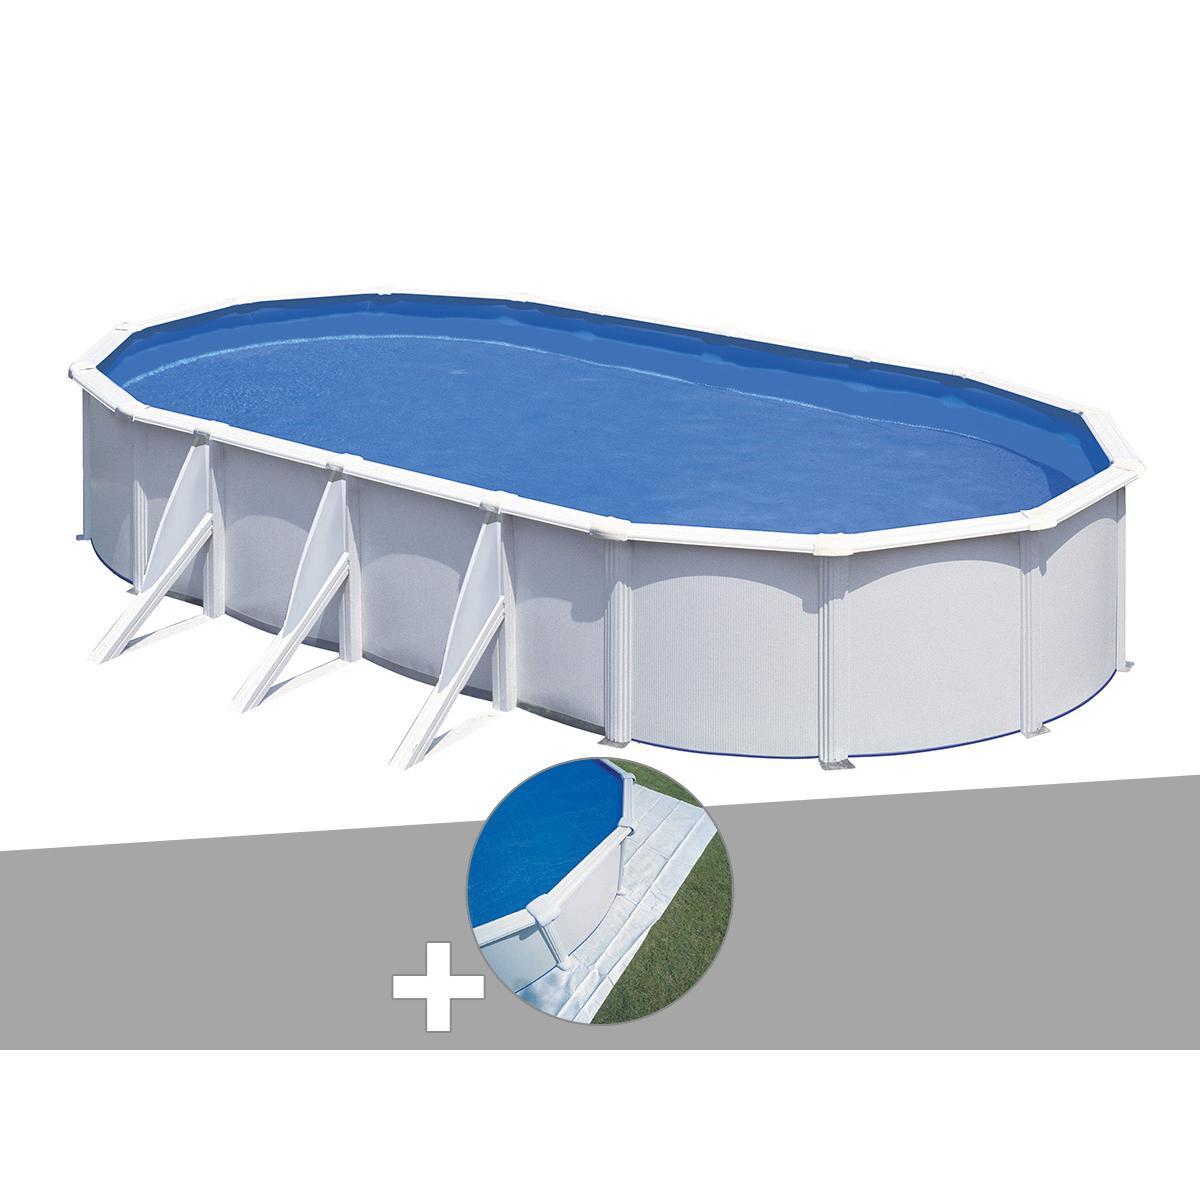 Gre Kit piscine acier blanc Gré Fidji ovale 6,34 x 3,99 x 1,22 m + Tapis de sol